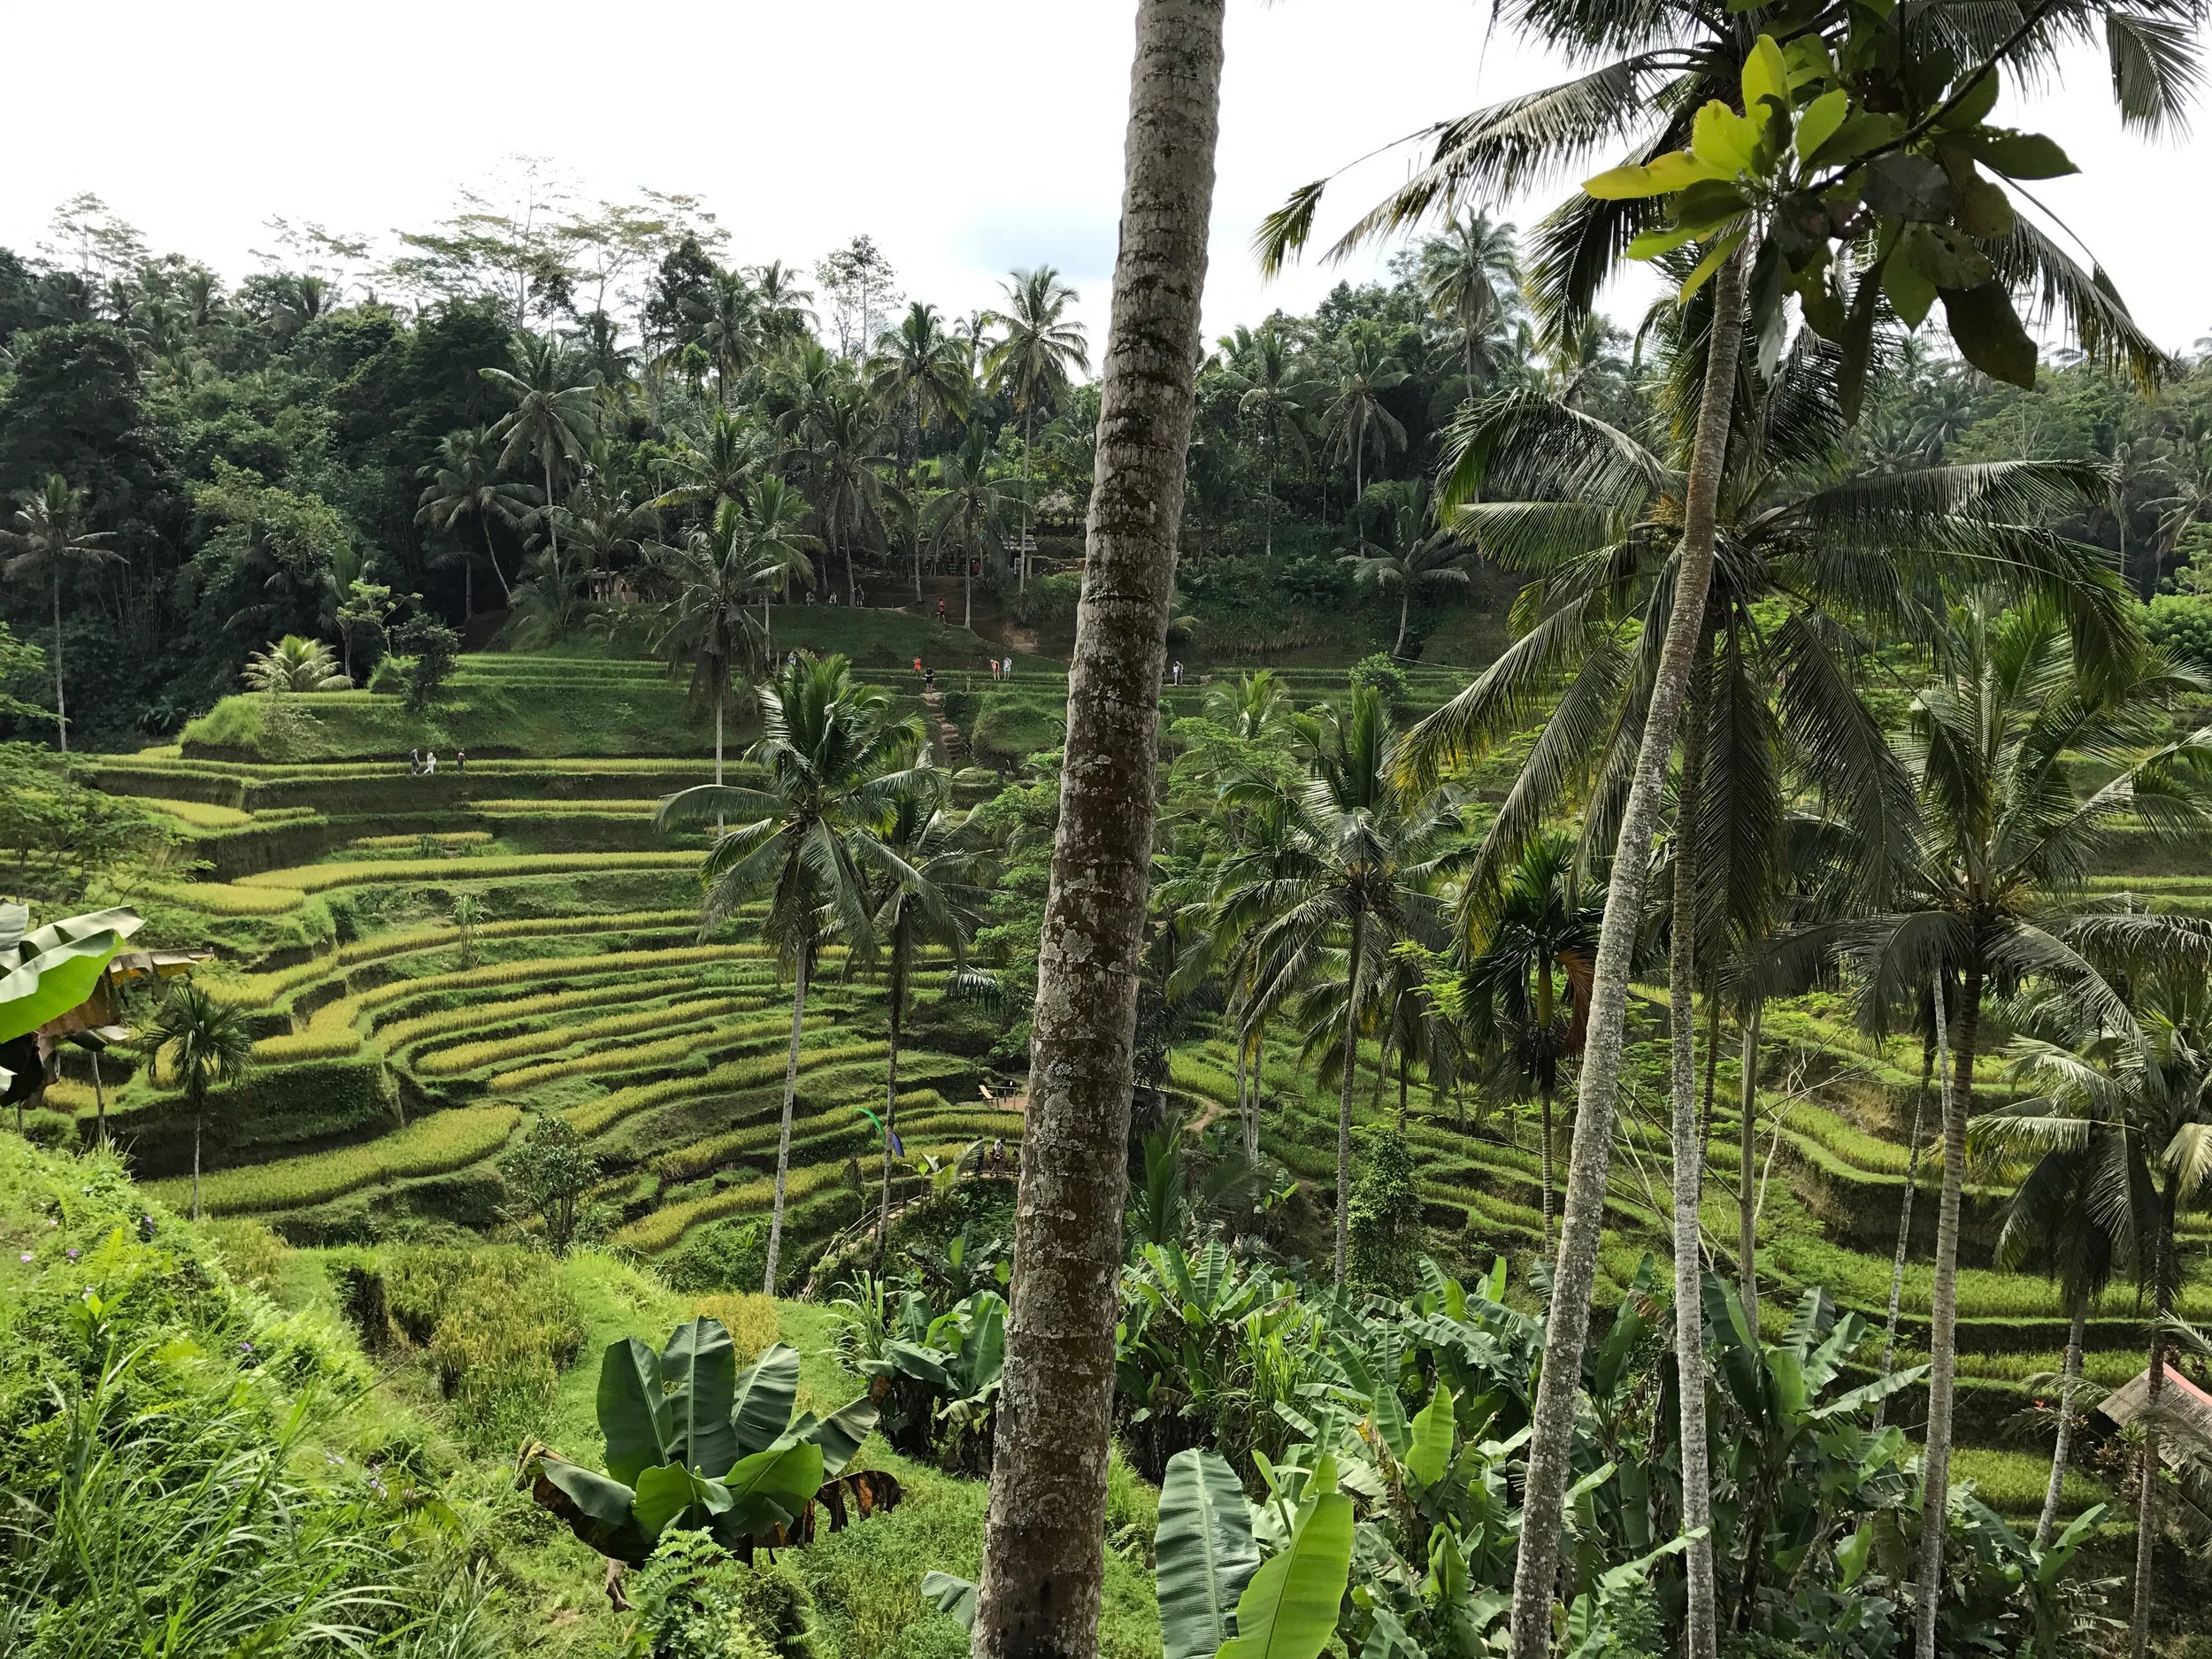 Tegallalang Rice Terraces Bali Indonesia